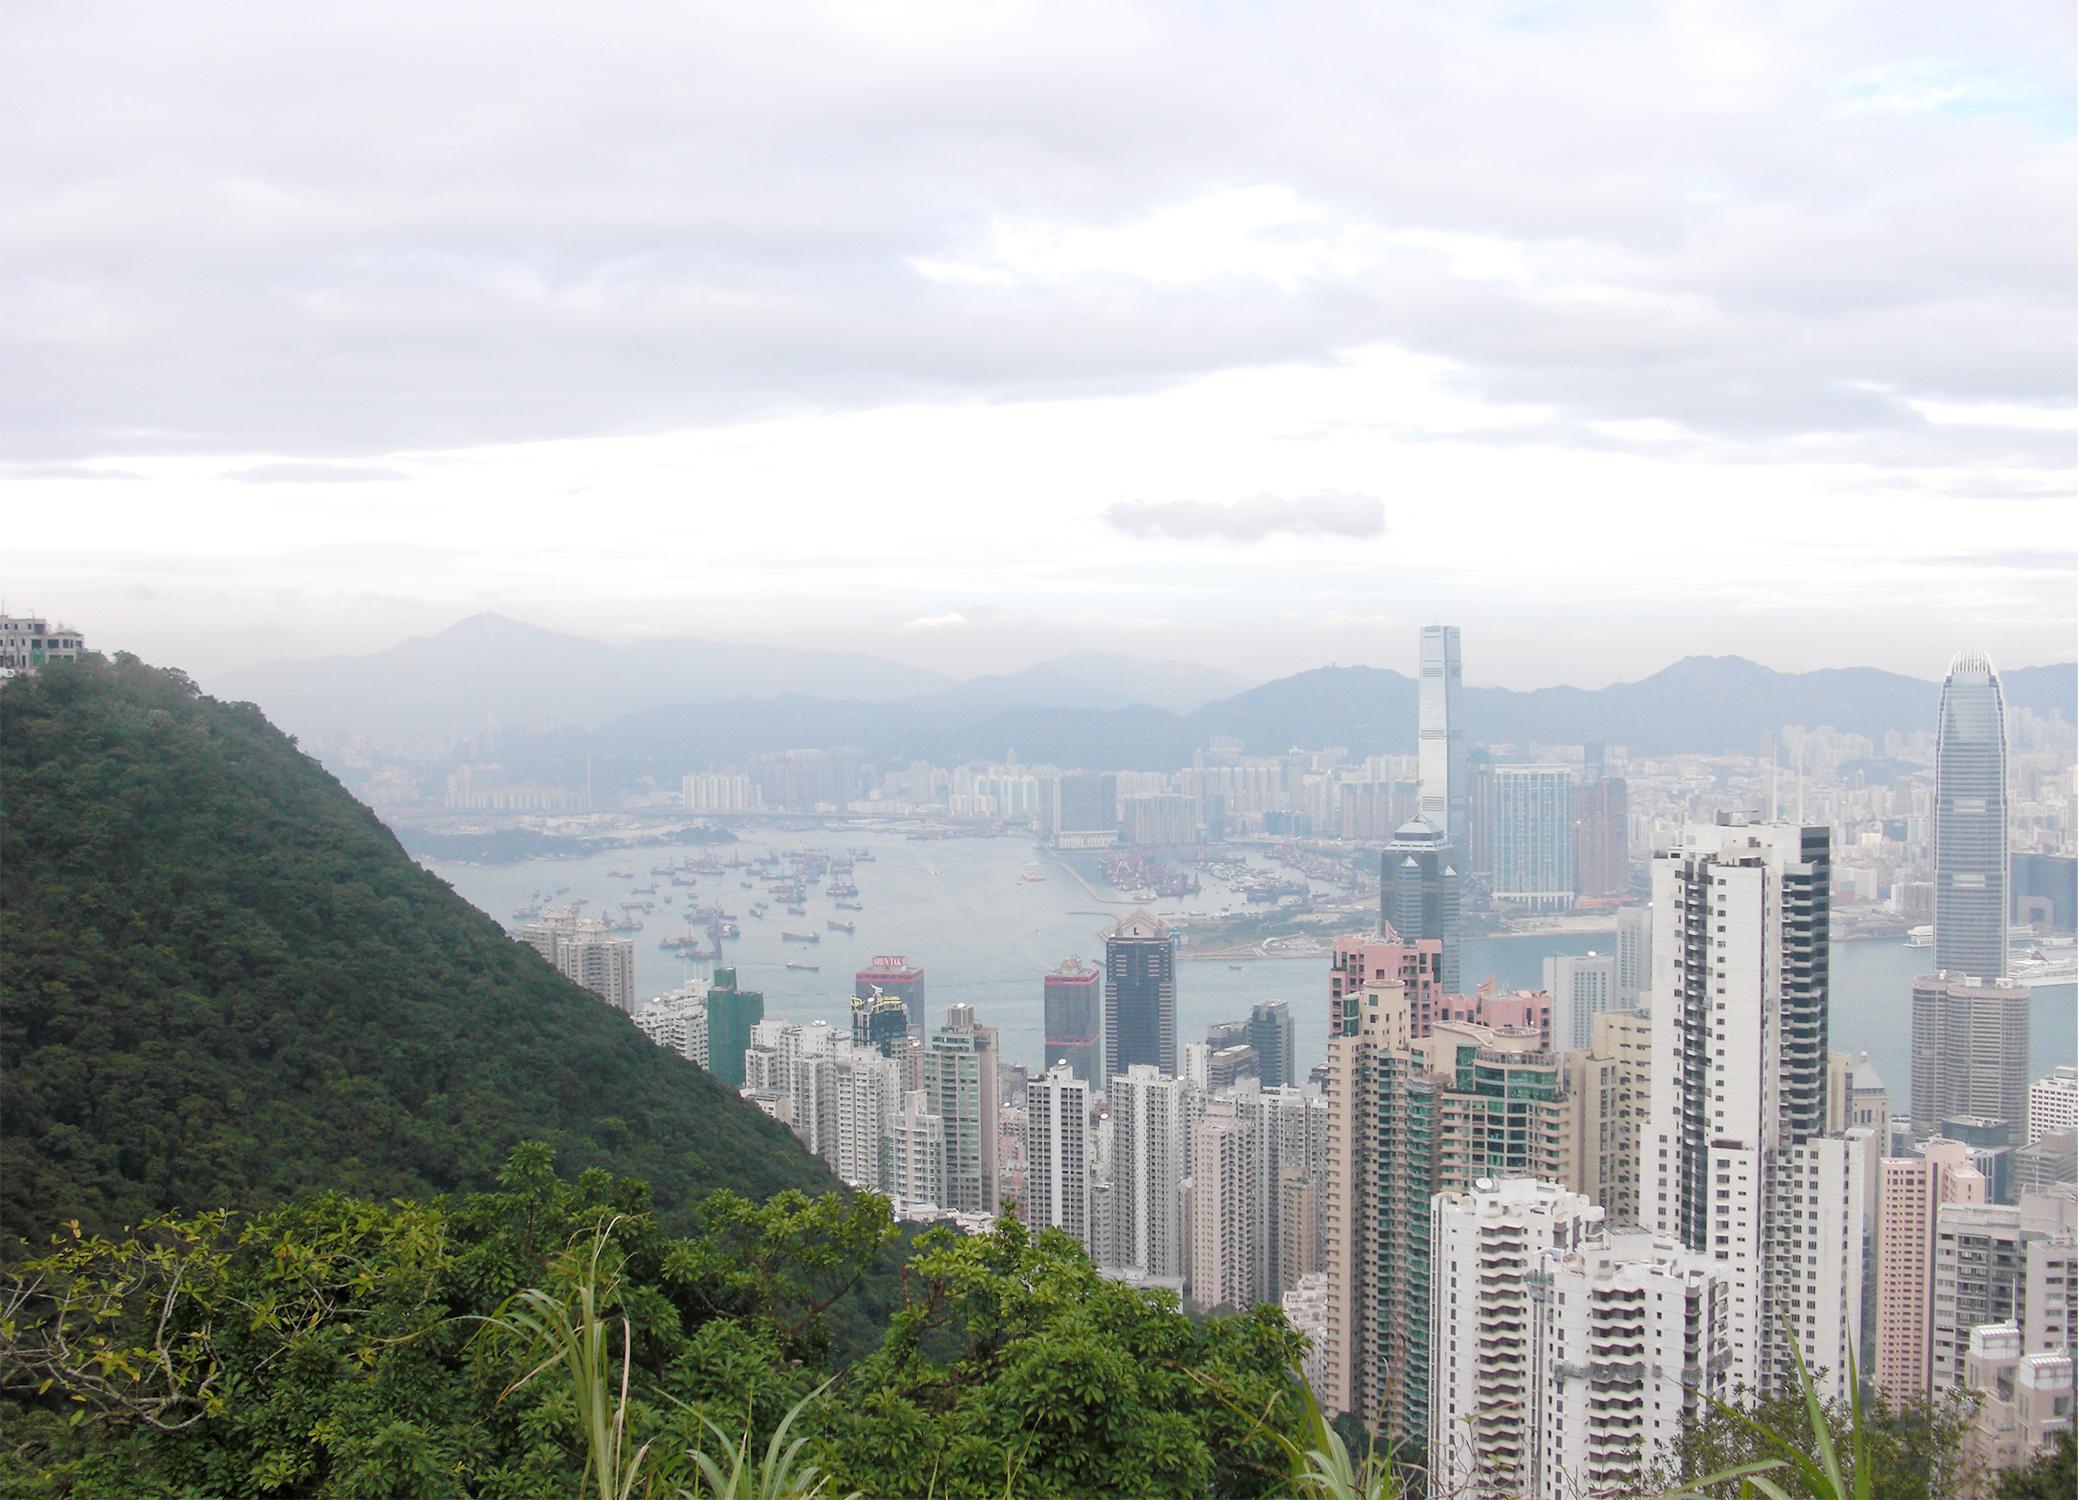 Hong Kong azië China The Peak View Hong Kong city travel reis reizen lifestyle by linda De piek